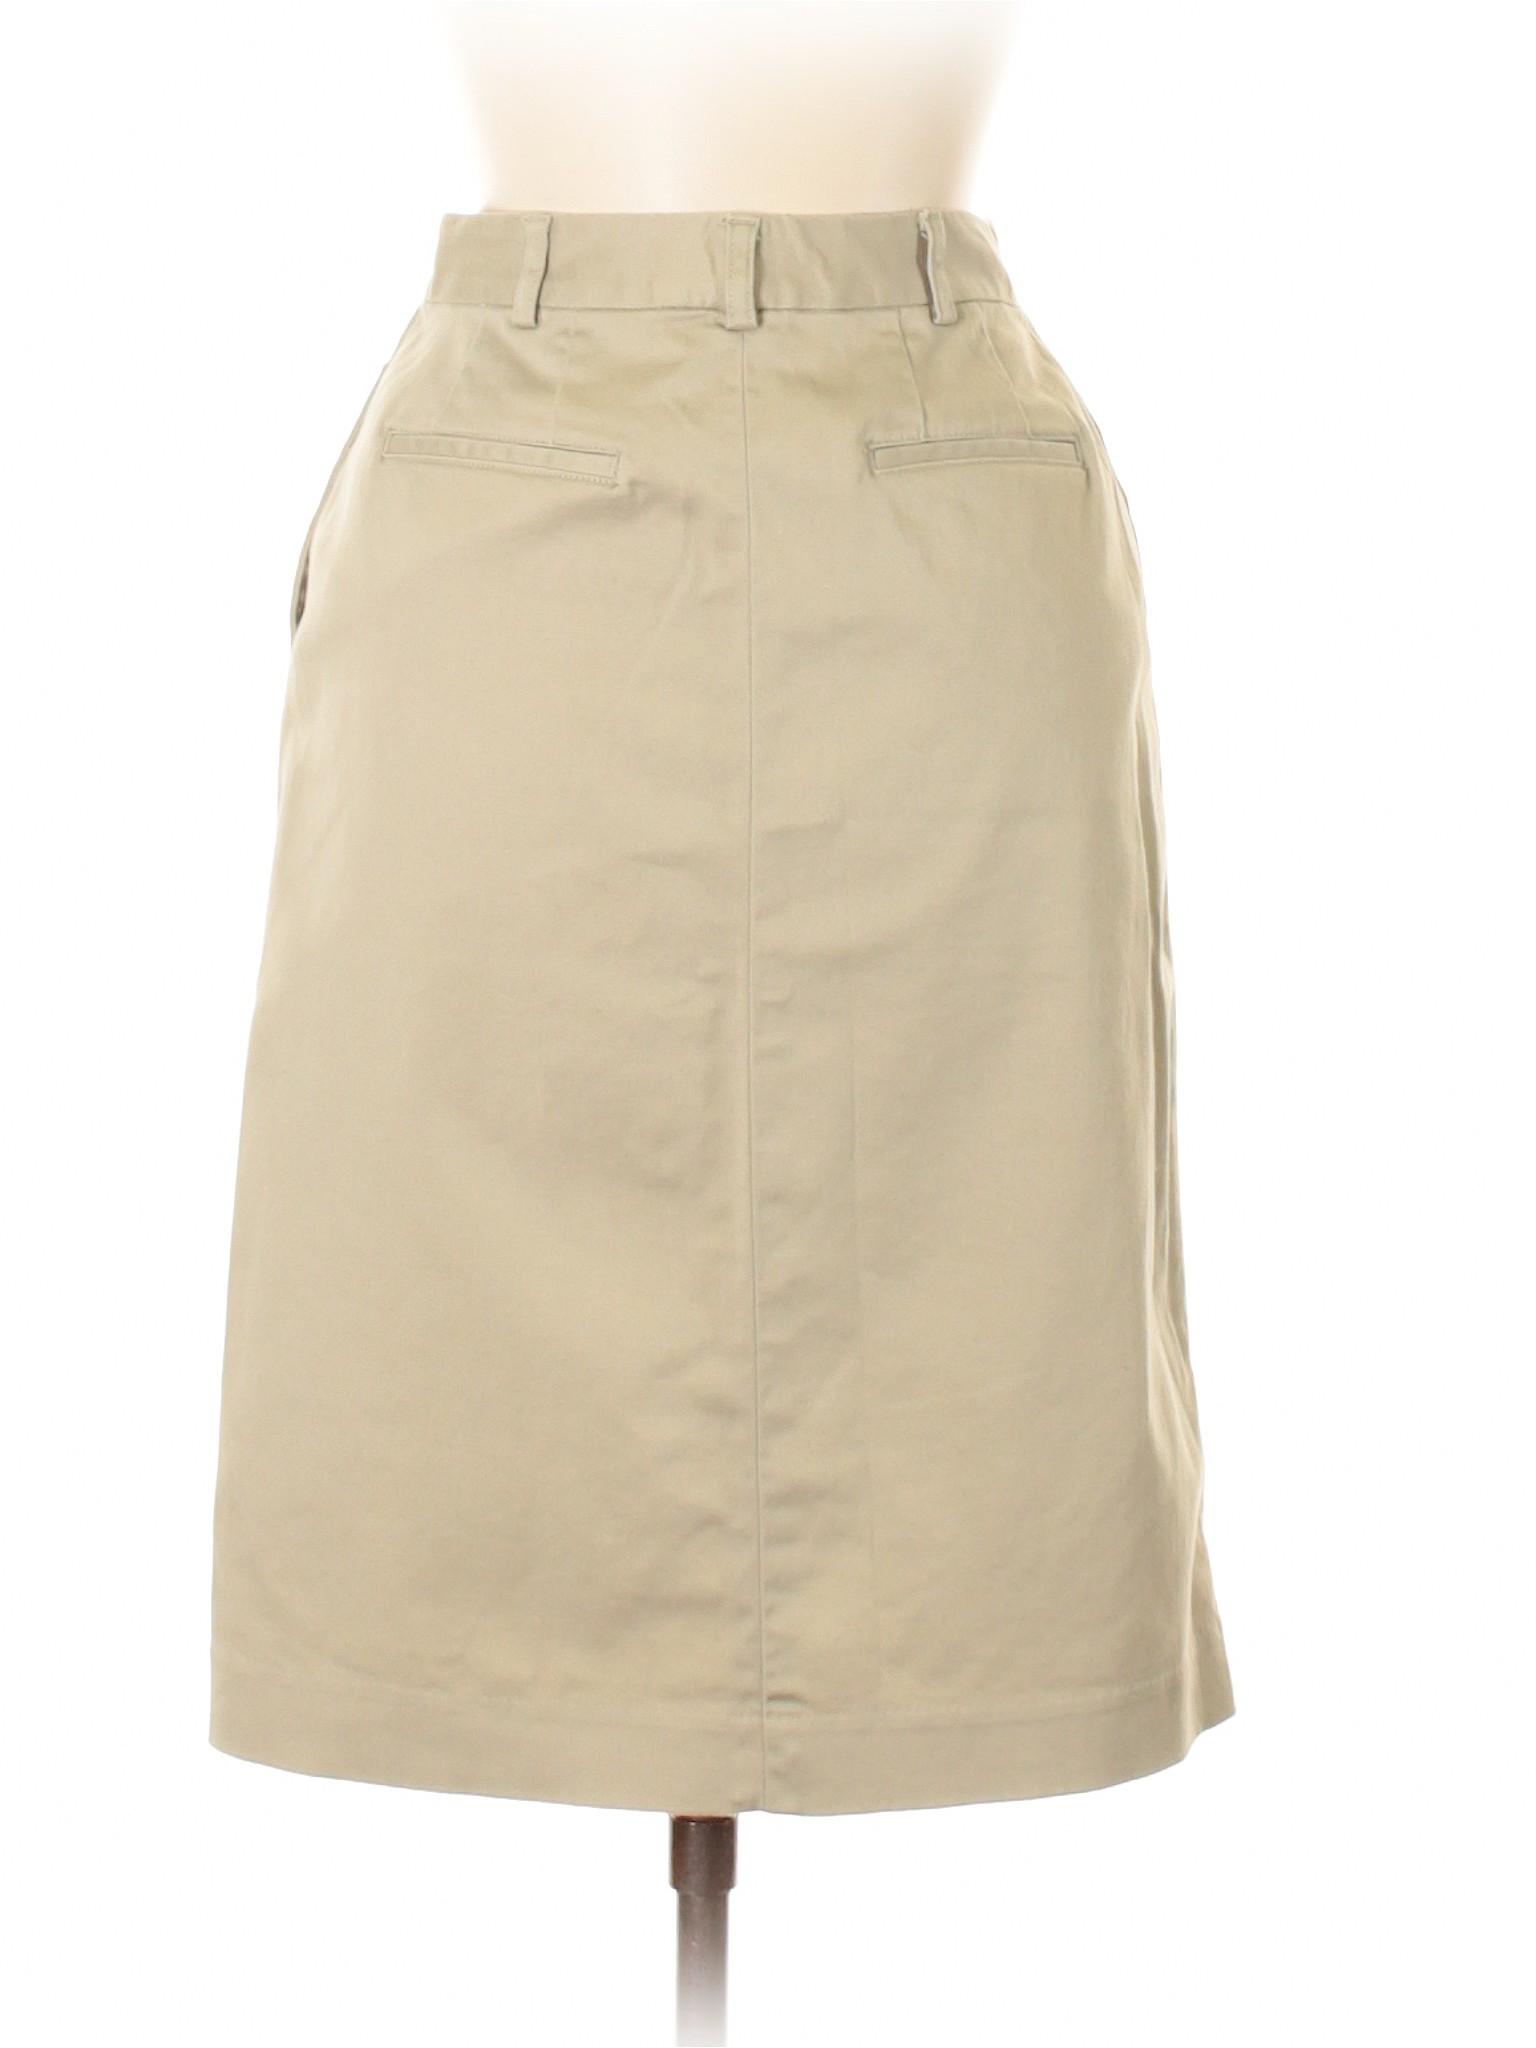 Skirt leisure Casual Boutique Casual Gap leisure Boutique Gap 0wUwz6q